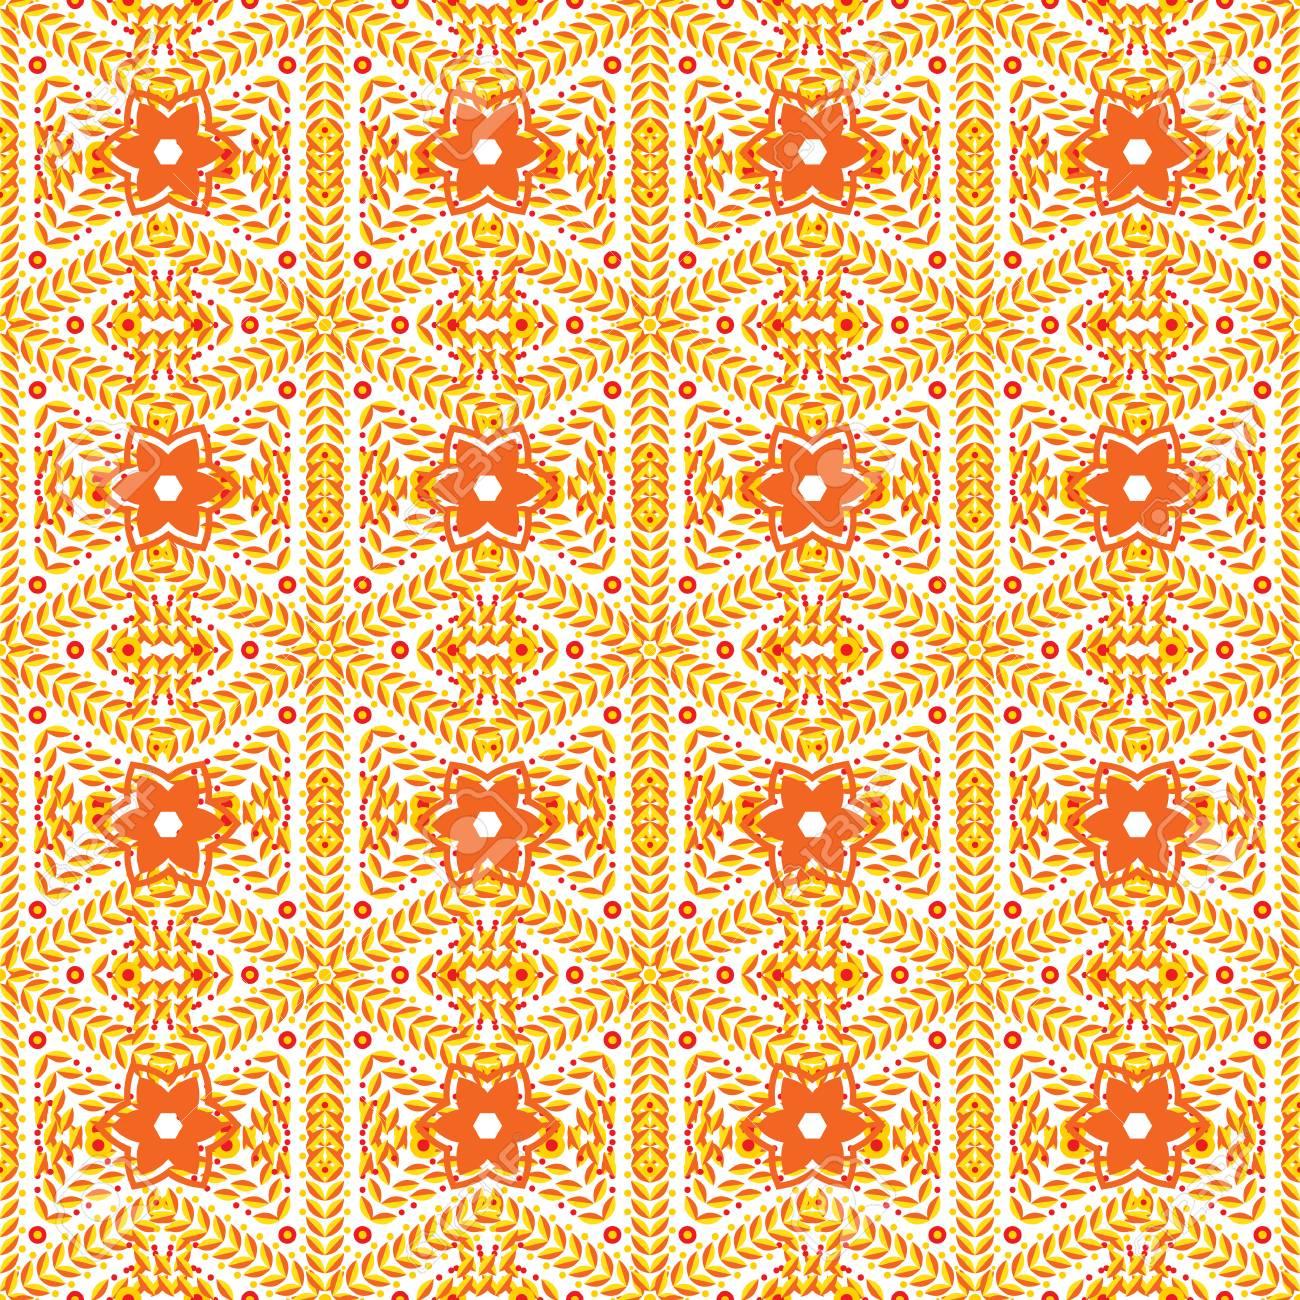 48322302 orange luxury background art deco for background wallpaper scrapbooking prints